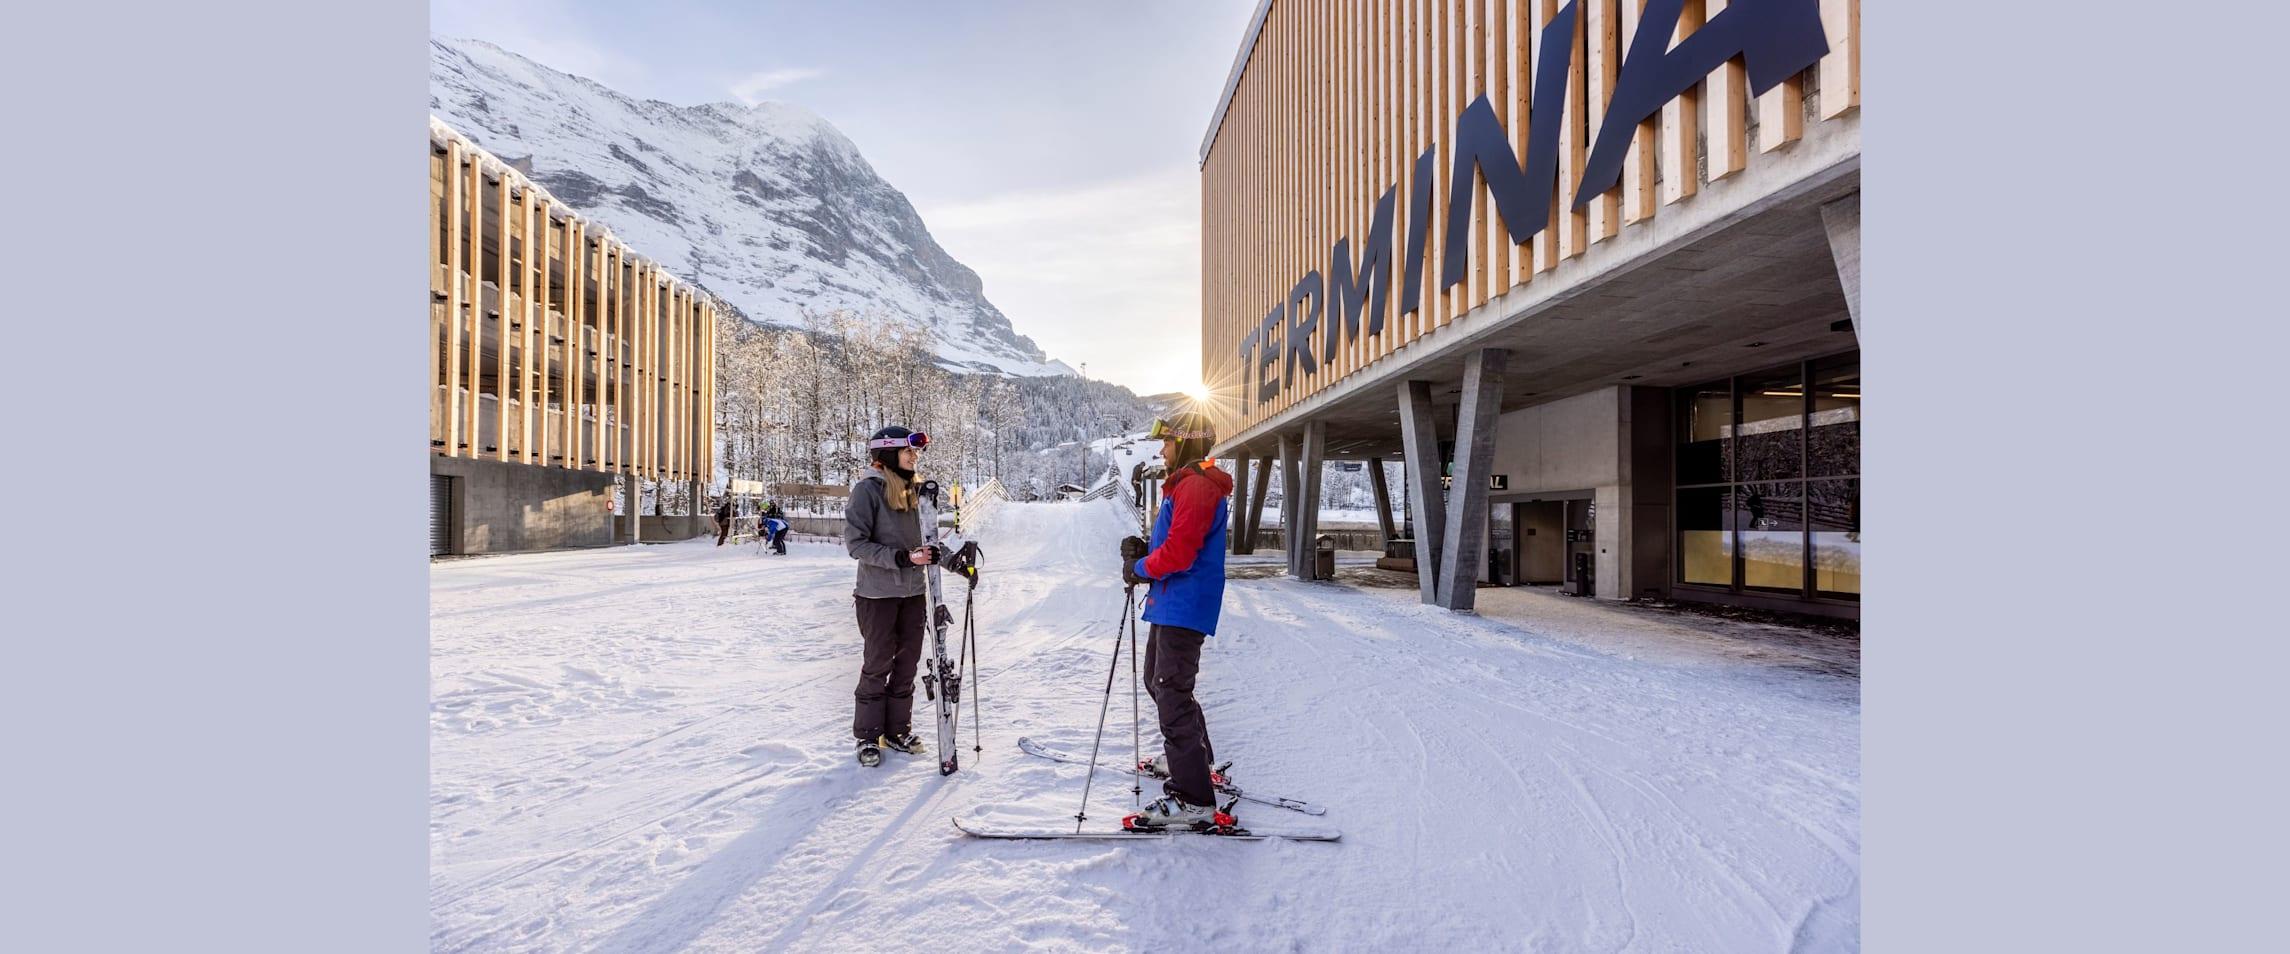 Grindelwald Terminal Skibruecke Skifahrer Abendstimmung kl